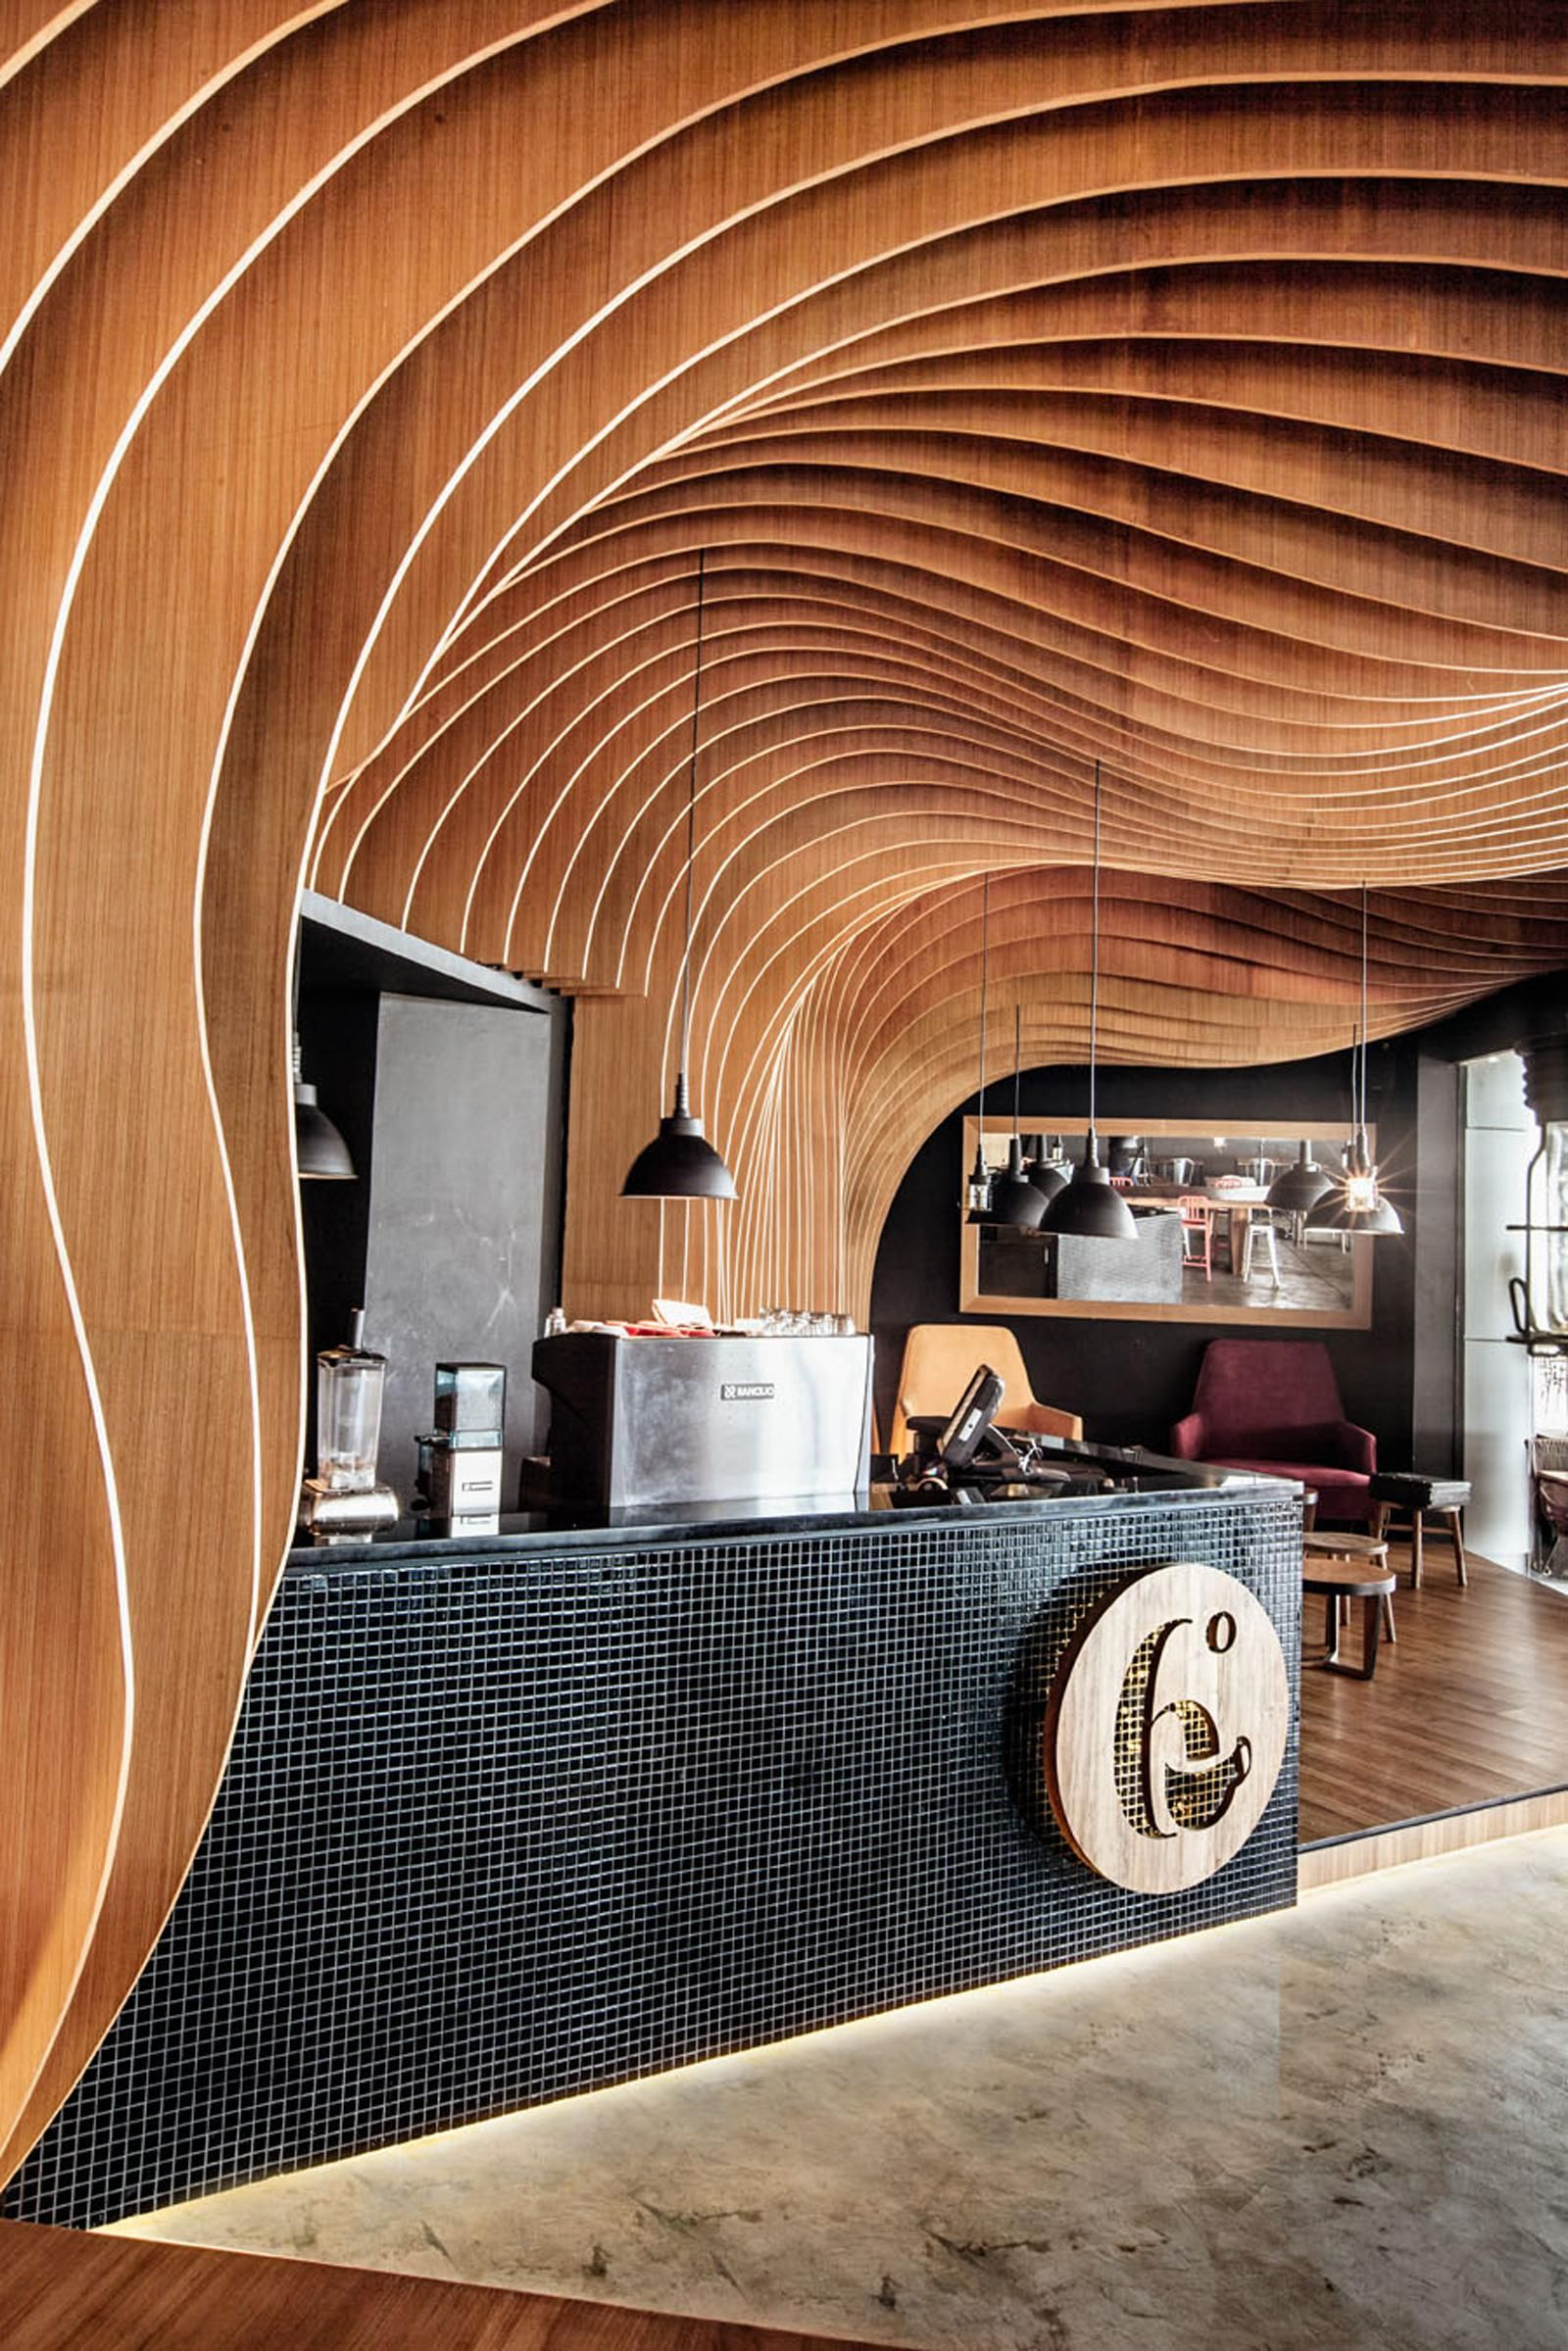 Six degrees cafe oozn design q pinterest for Raumgestaltung cafe